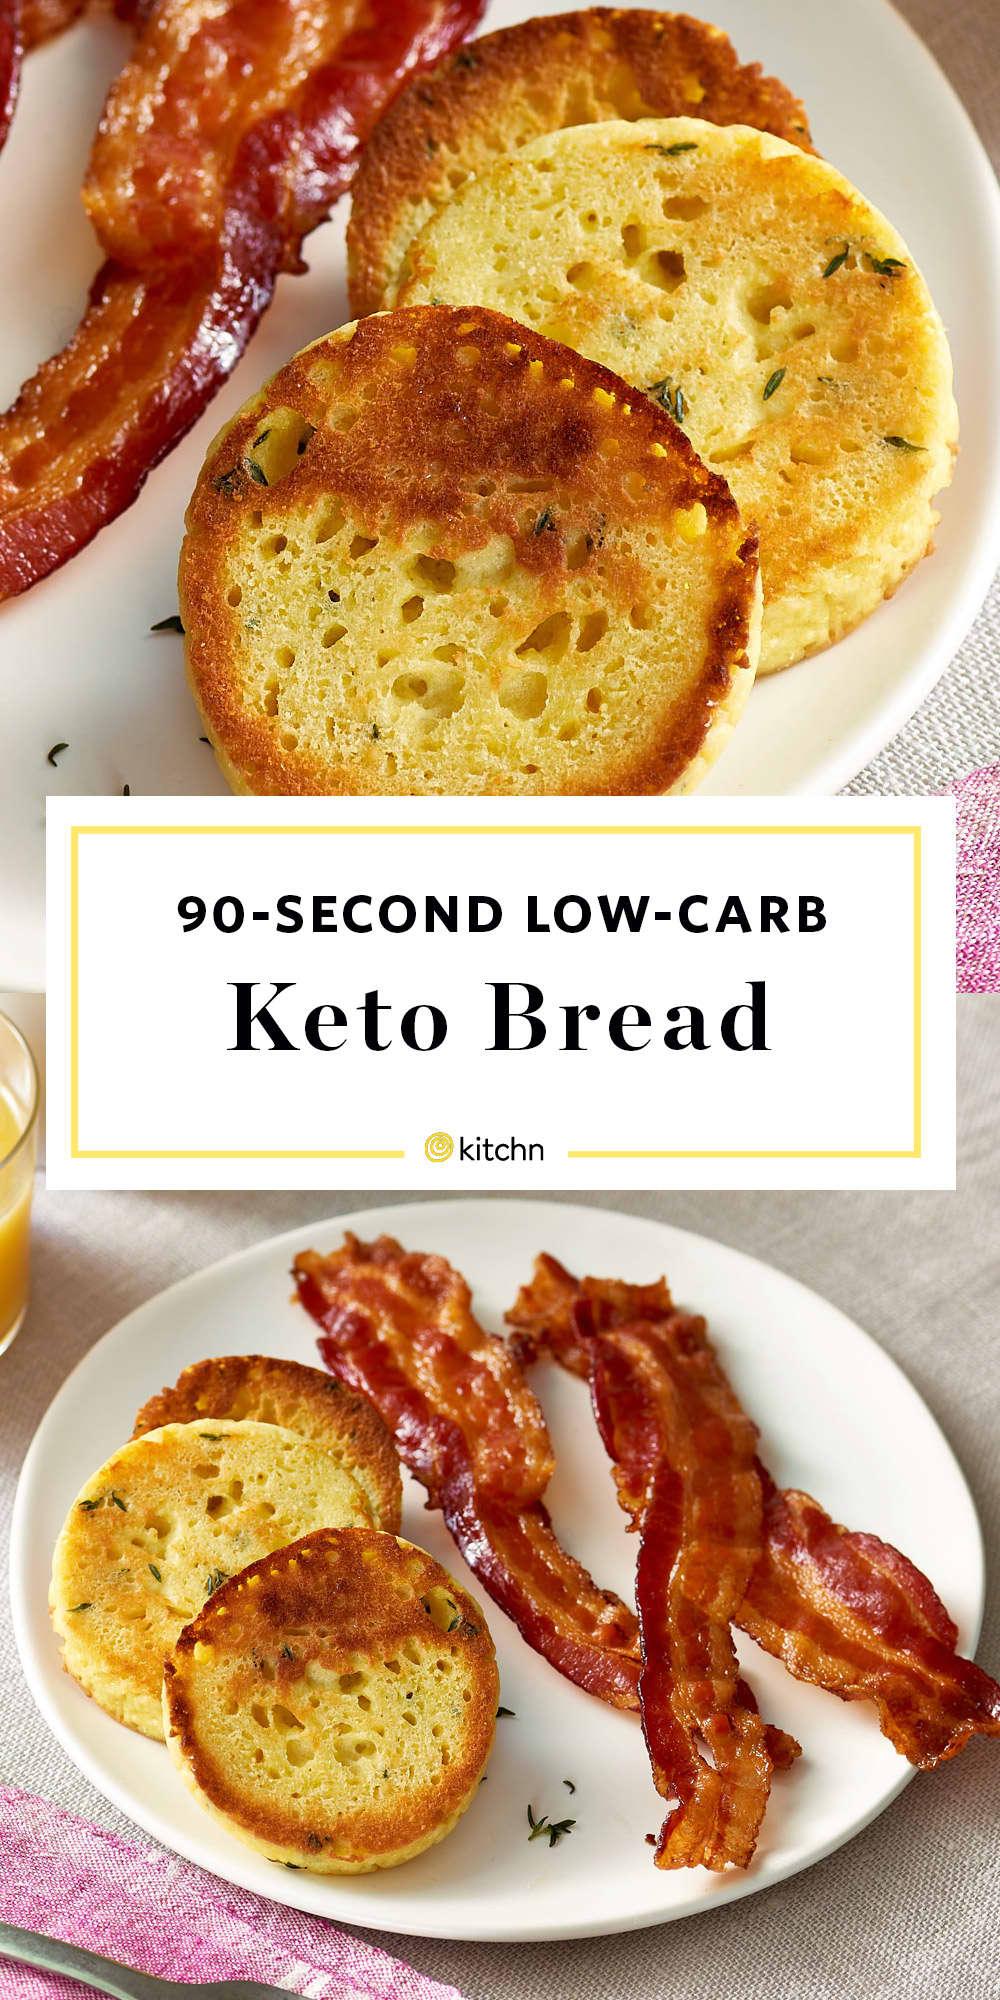 Keto Bread Recipe Review Low Carb 90 Second Bread Kitchn